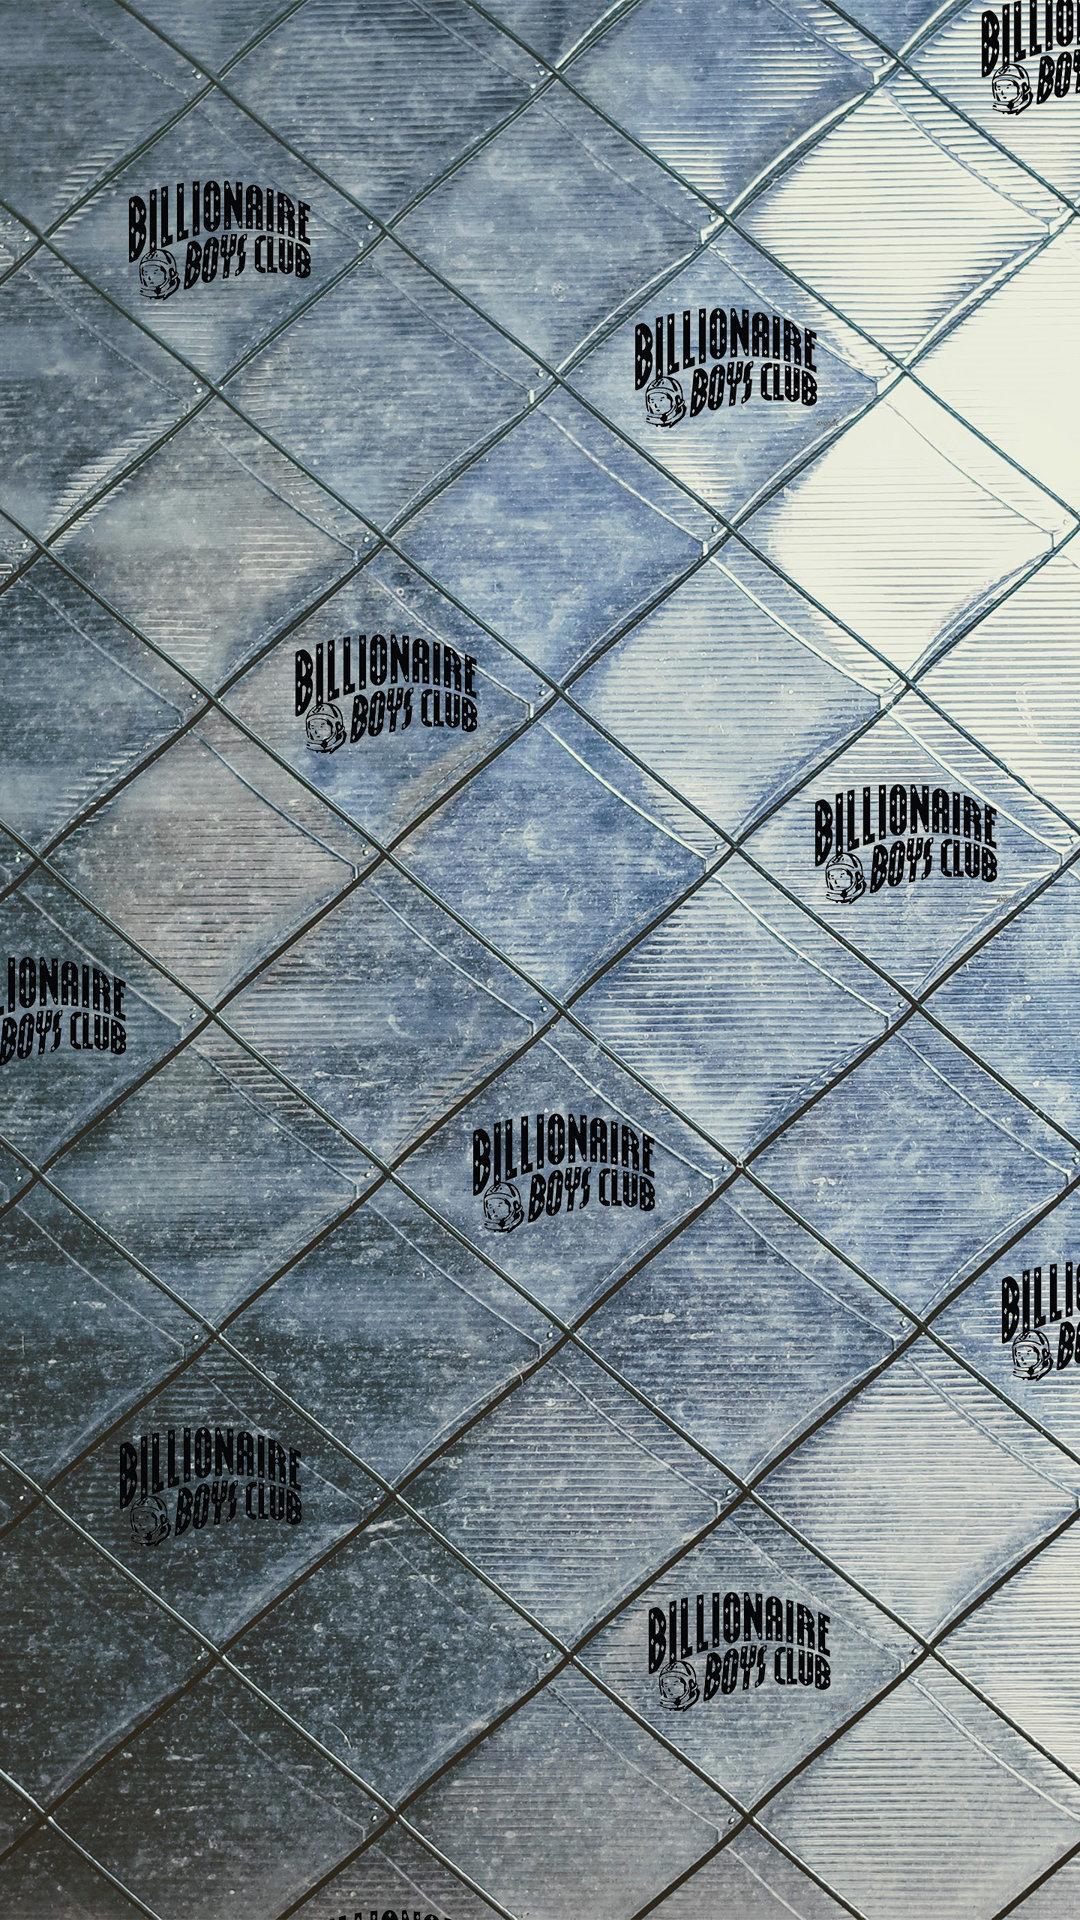 Billionaire Wallpapers Wallpaper Cave